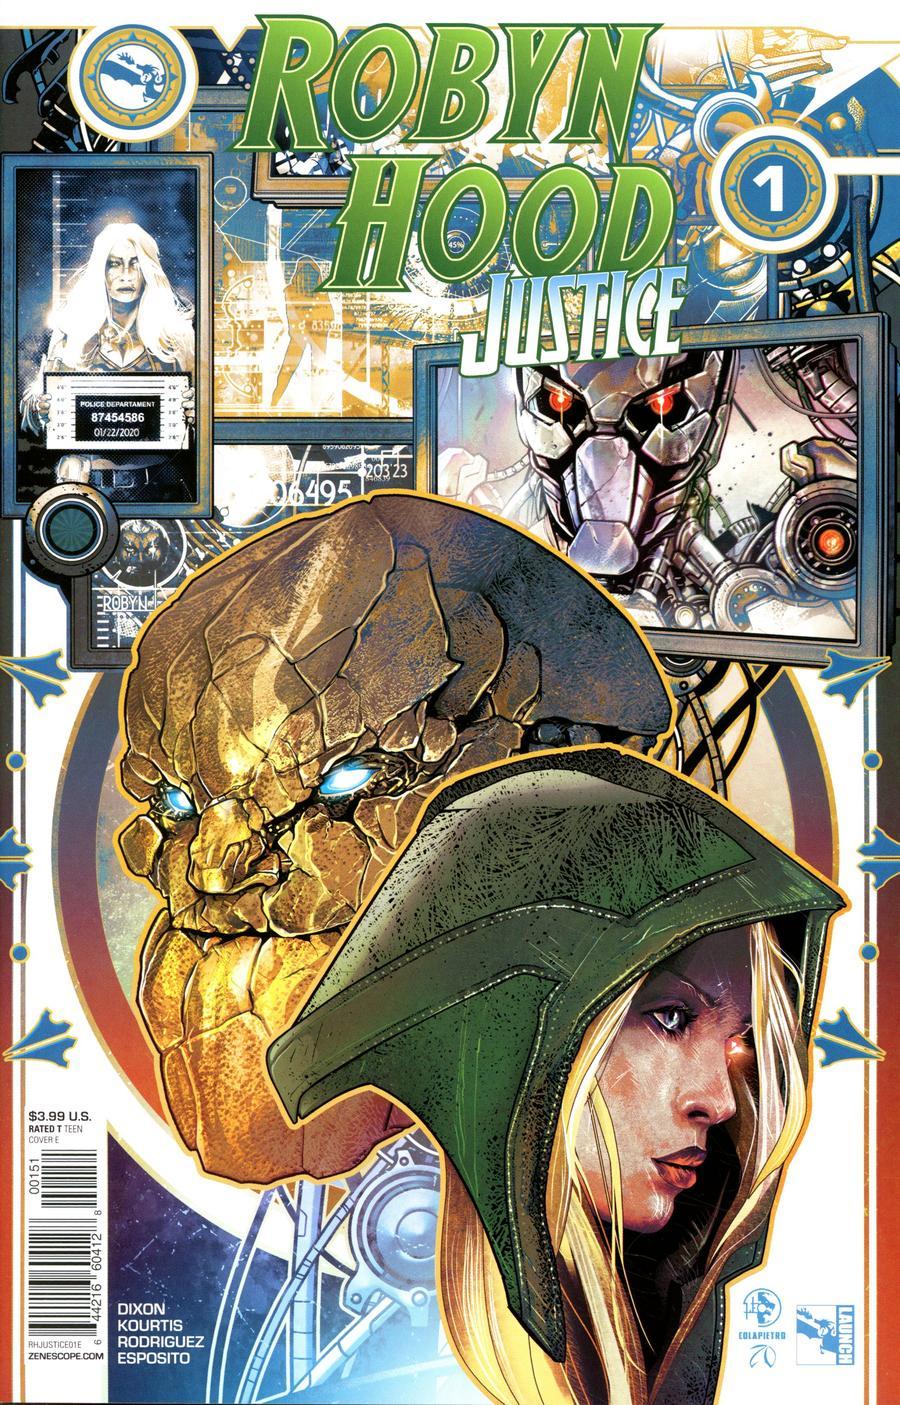 Grimm Fairy Tales Presents Robyn Hood Justice #1 Cover E Leonardo Colapietro